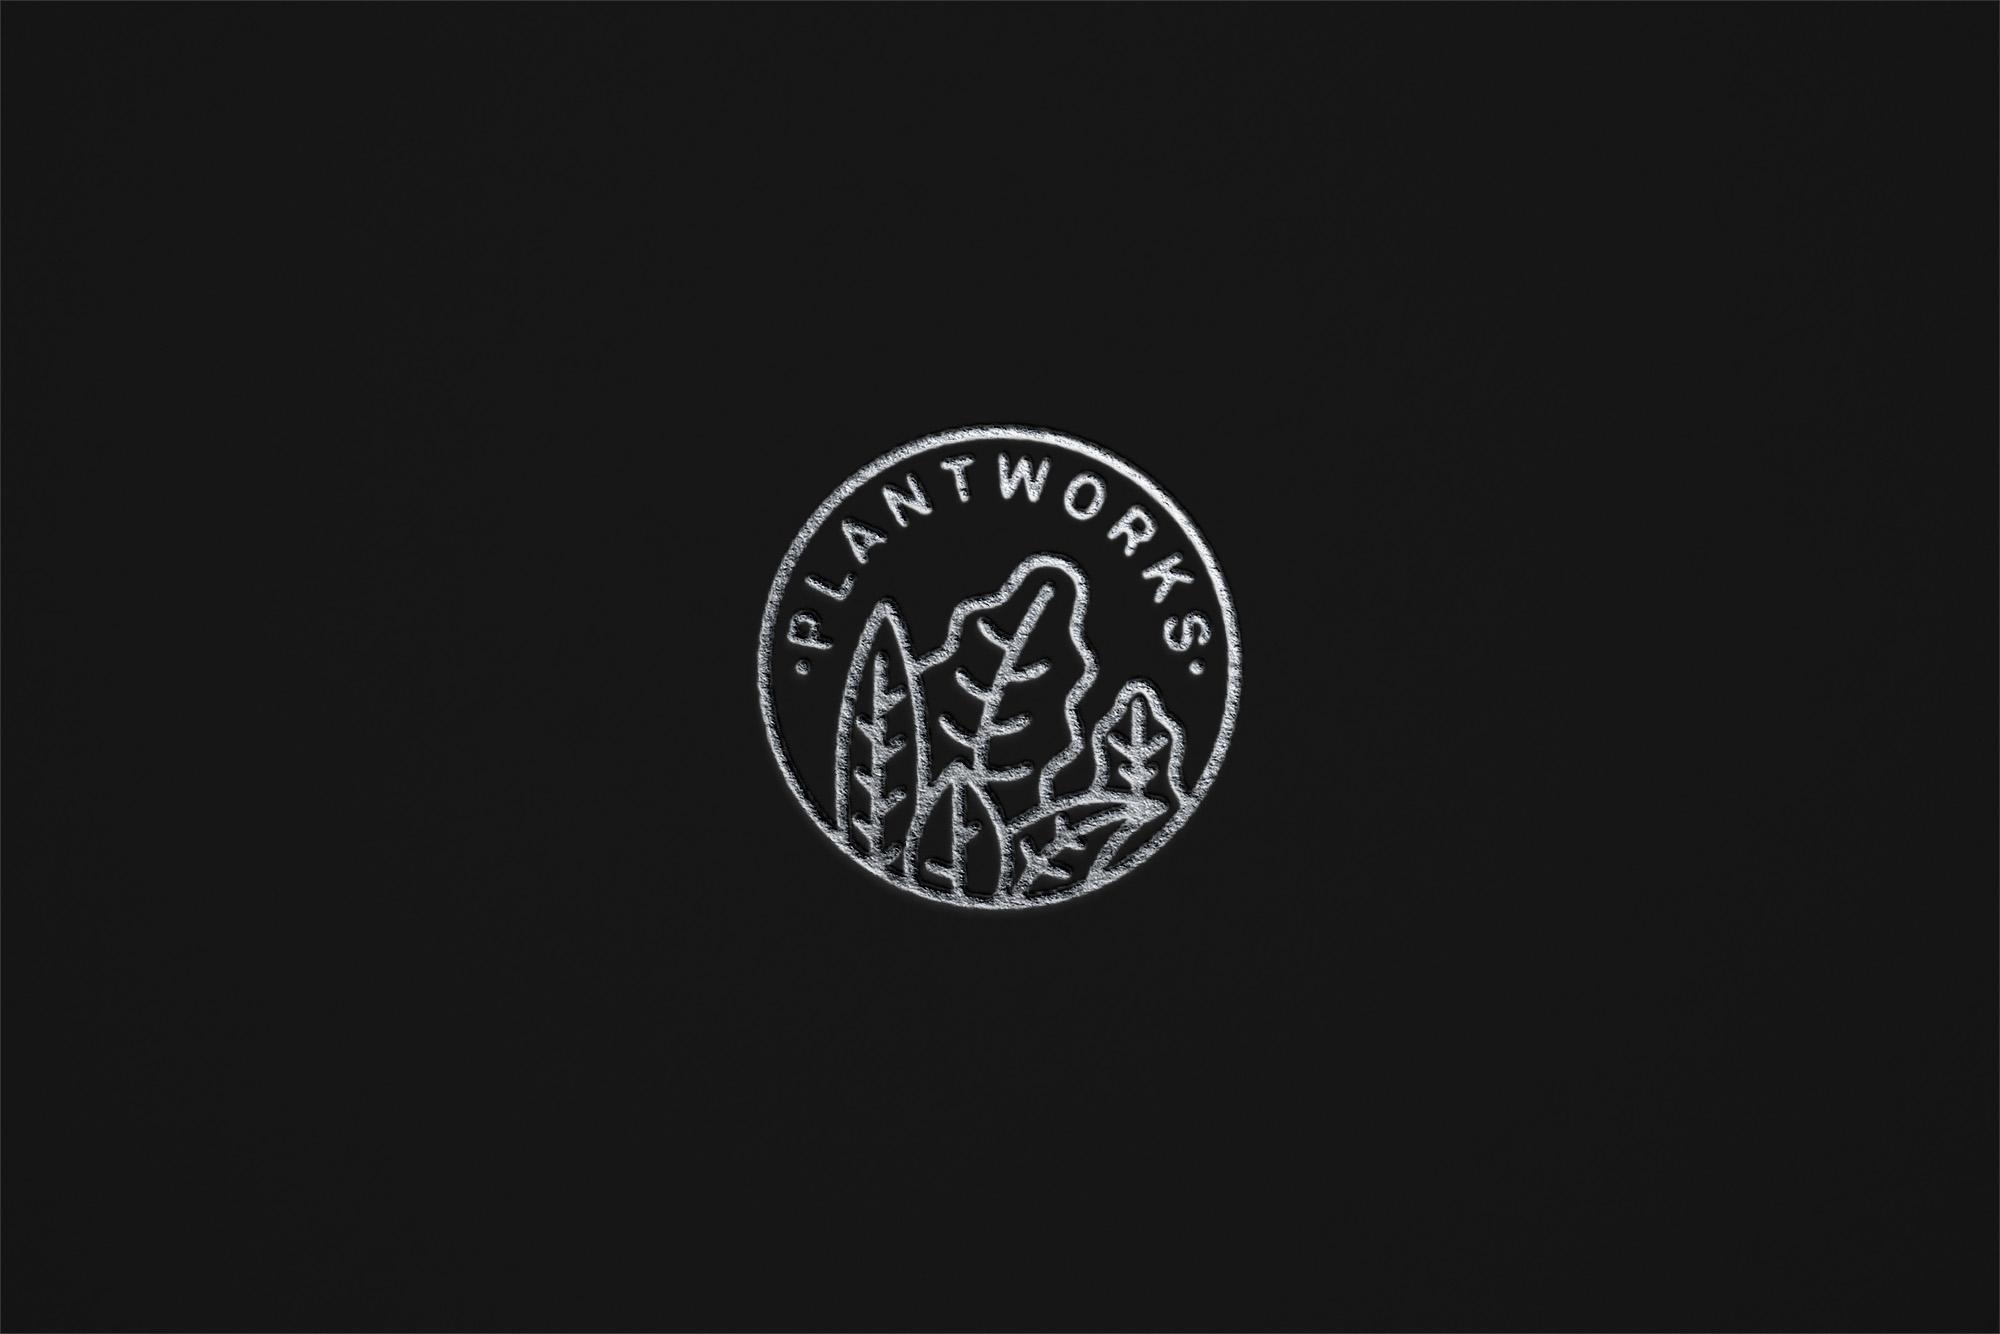 Letterpress-Logo-Plantworks.jpg